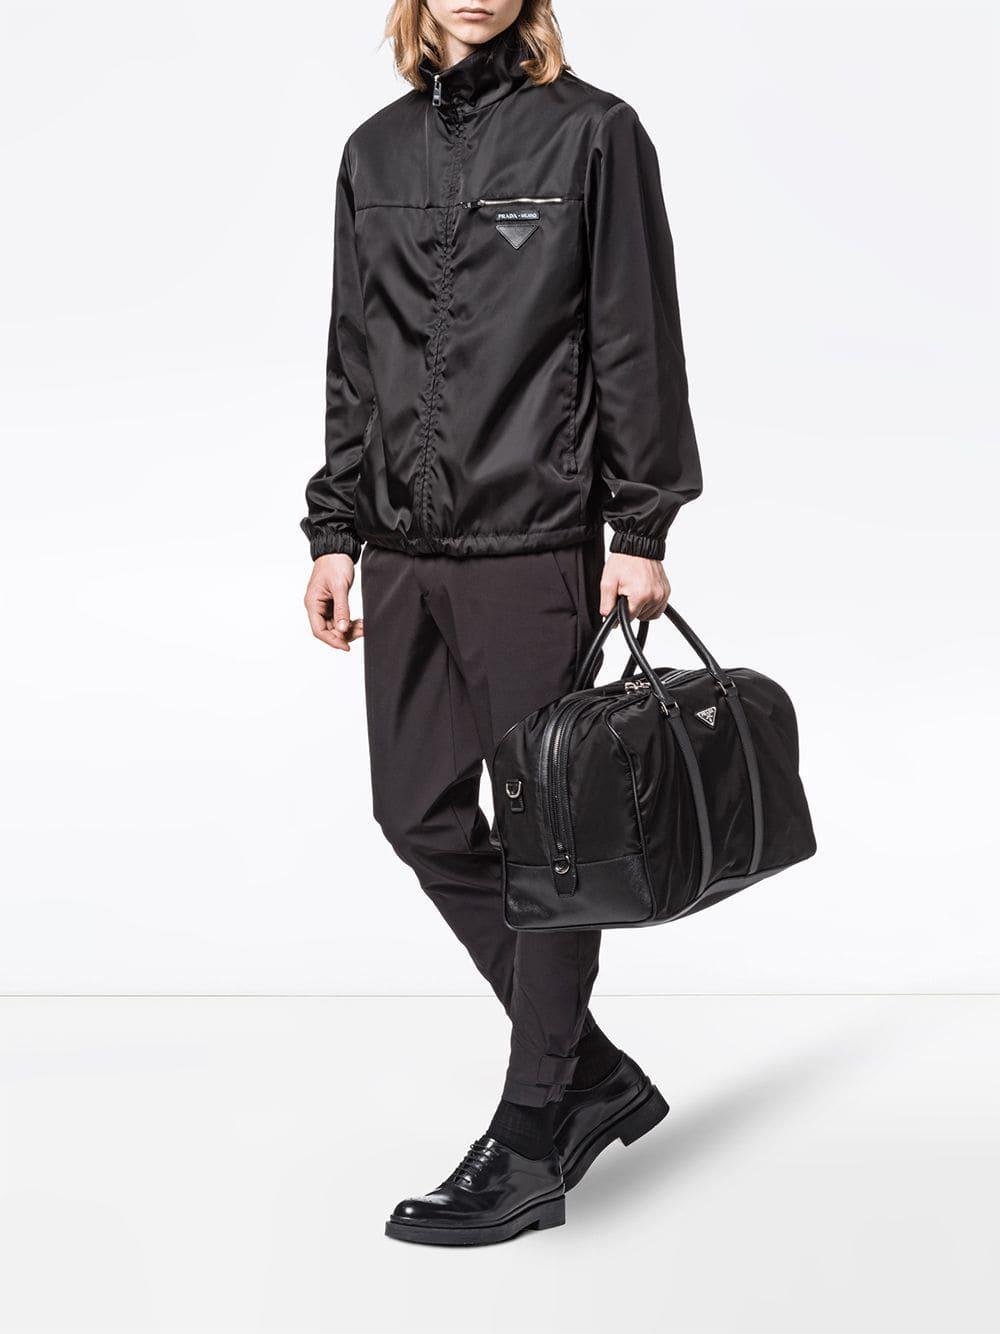 8770898ad0ea Prada Saffiano Leather Trim Duffle Bag in Black for Men - Lyst